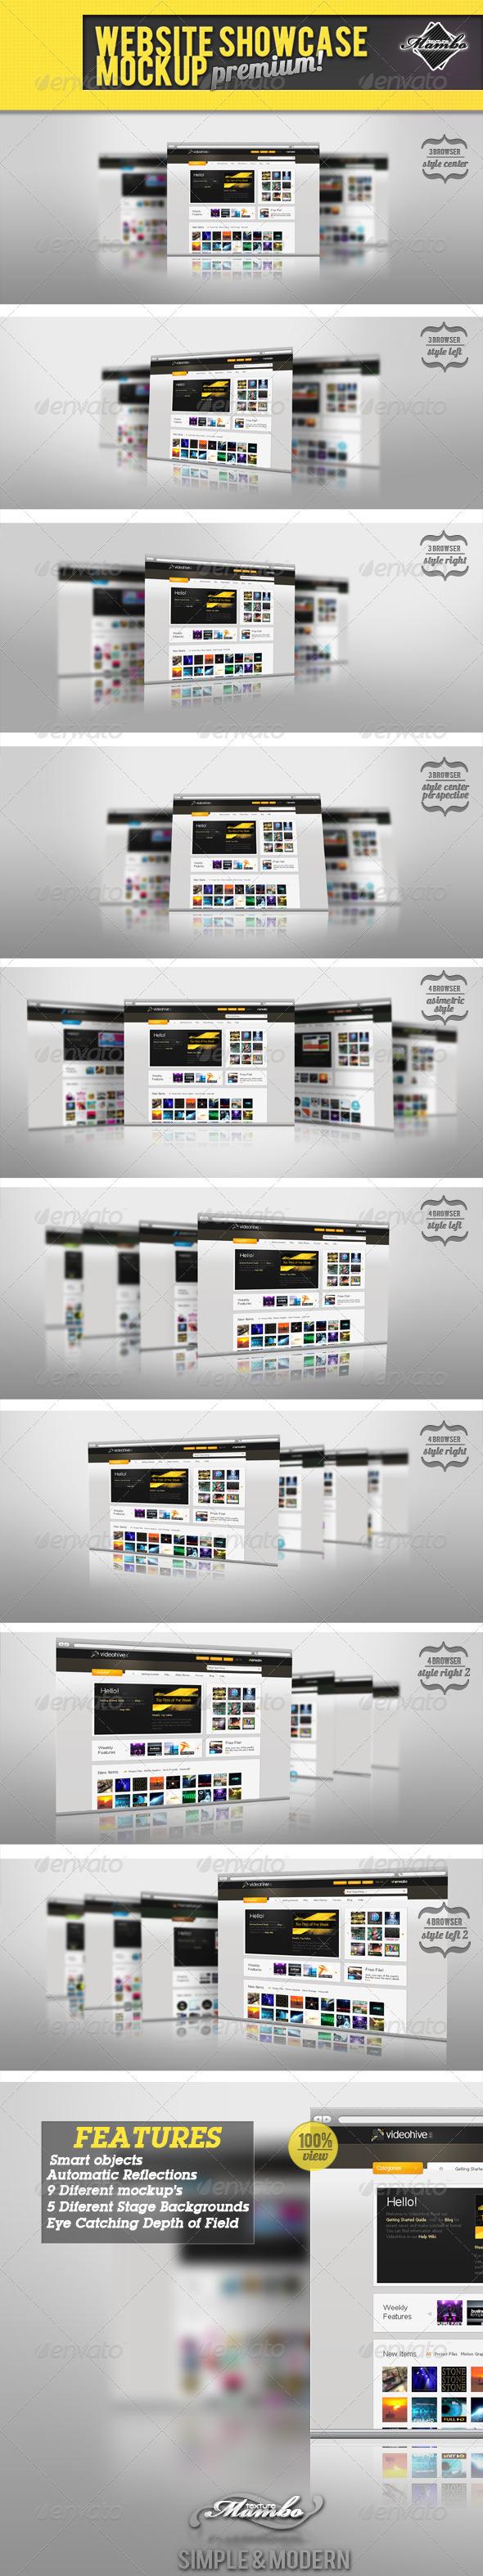 GraphicRiver Website Showcase Mockup 237796